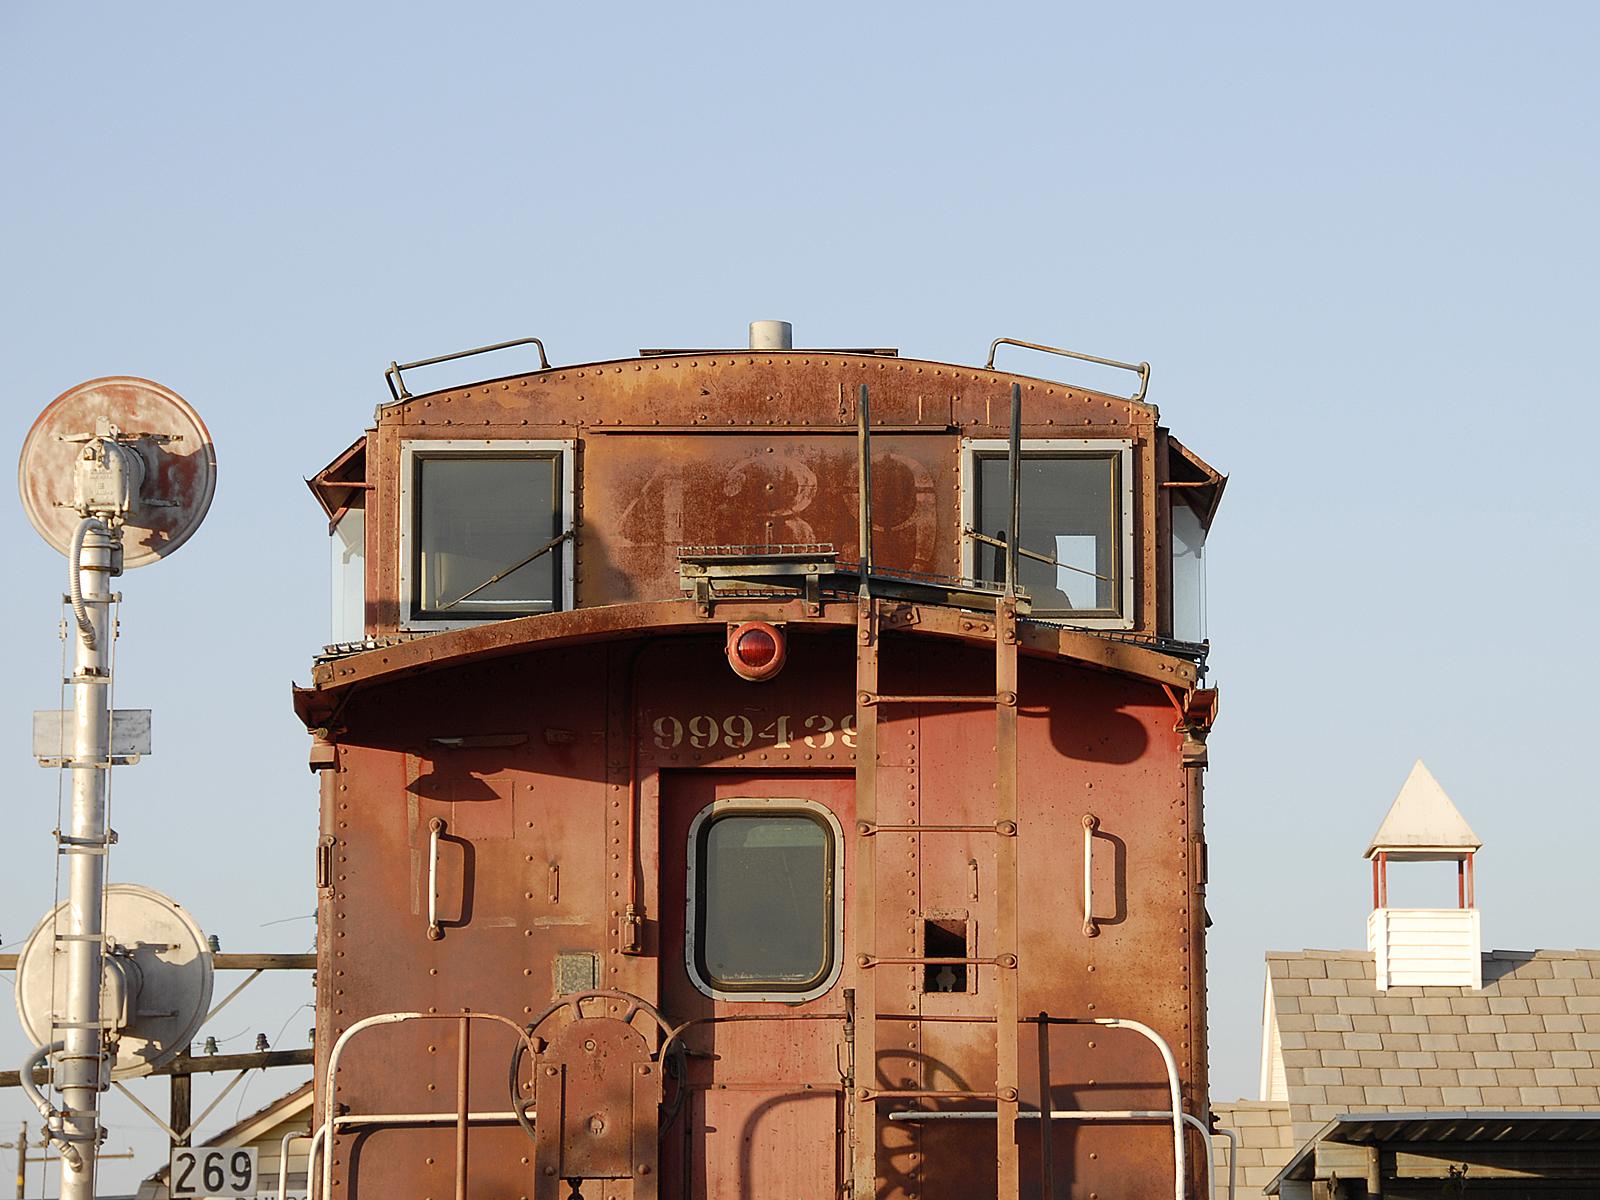 Old Caboose 439, Bspo06, Caboose, Engine, Rail, HQ Photo